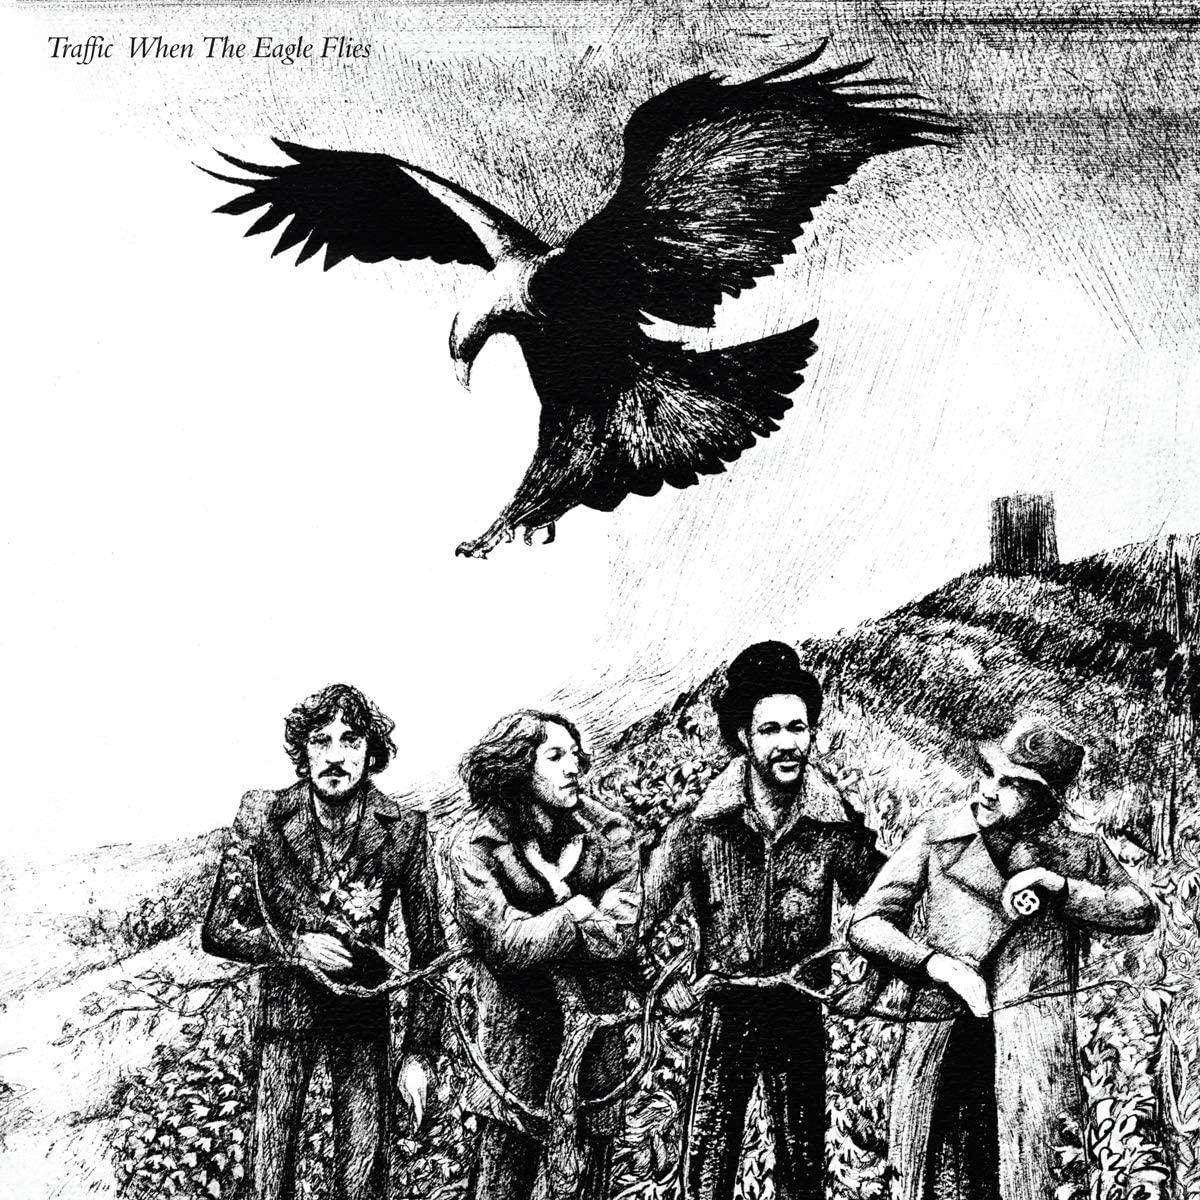 Copertina Vinile 33 giri When the Eagle Flies di Traffic